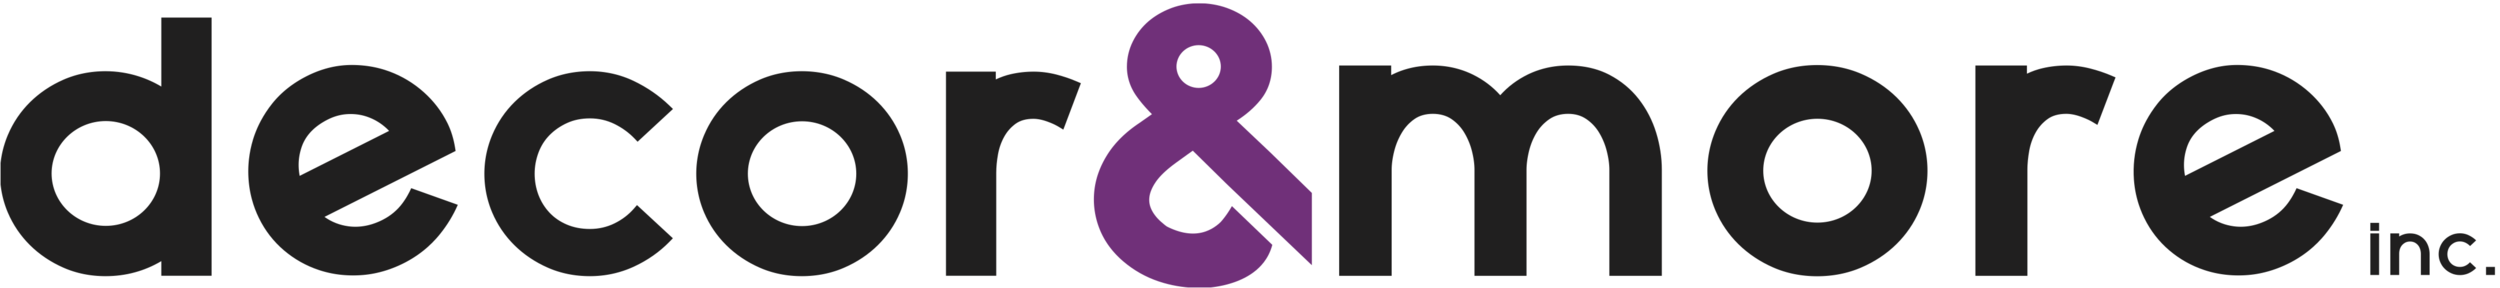 DM_logo_2017.png